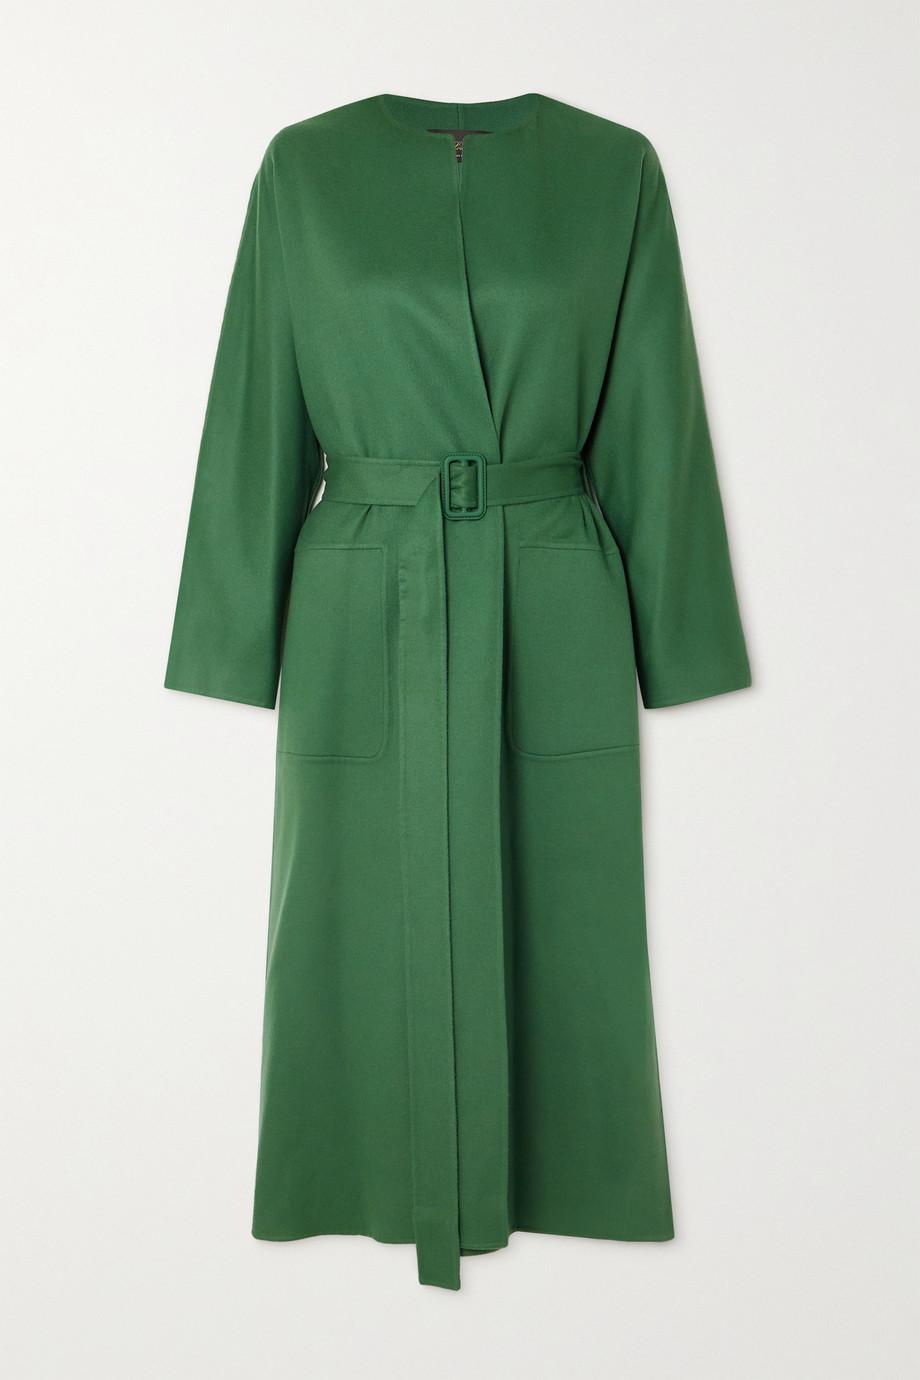 Loro Piana Emilien belted cashmere coat